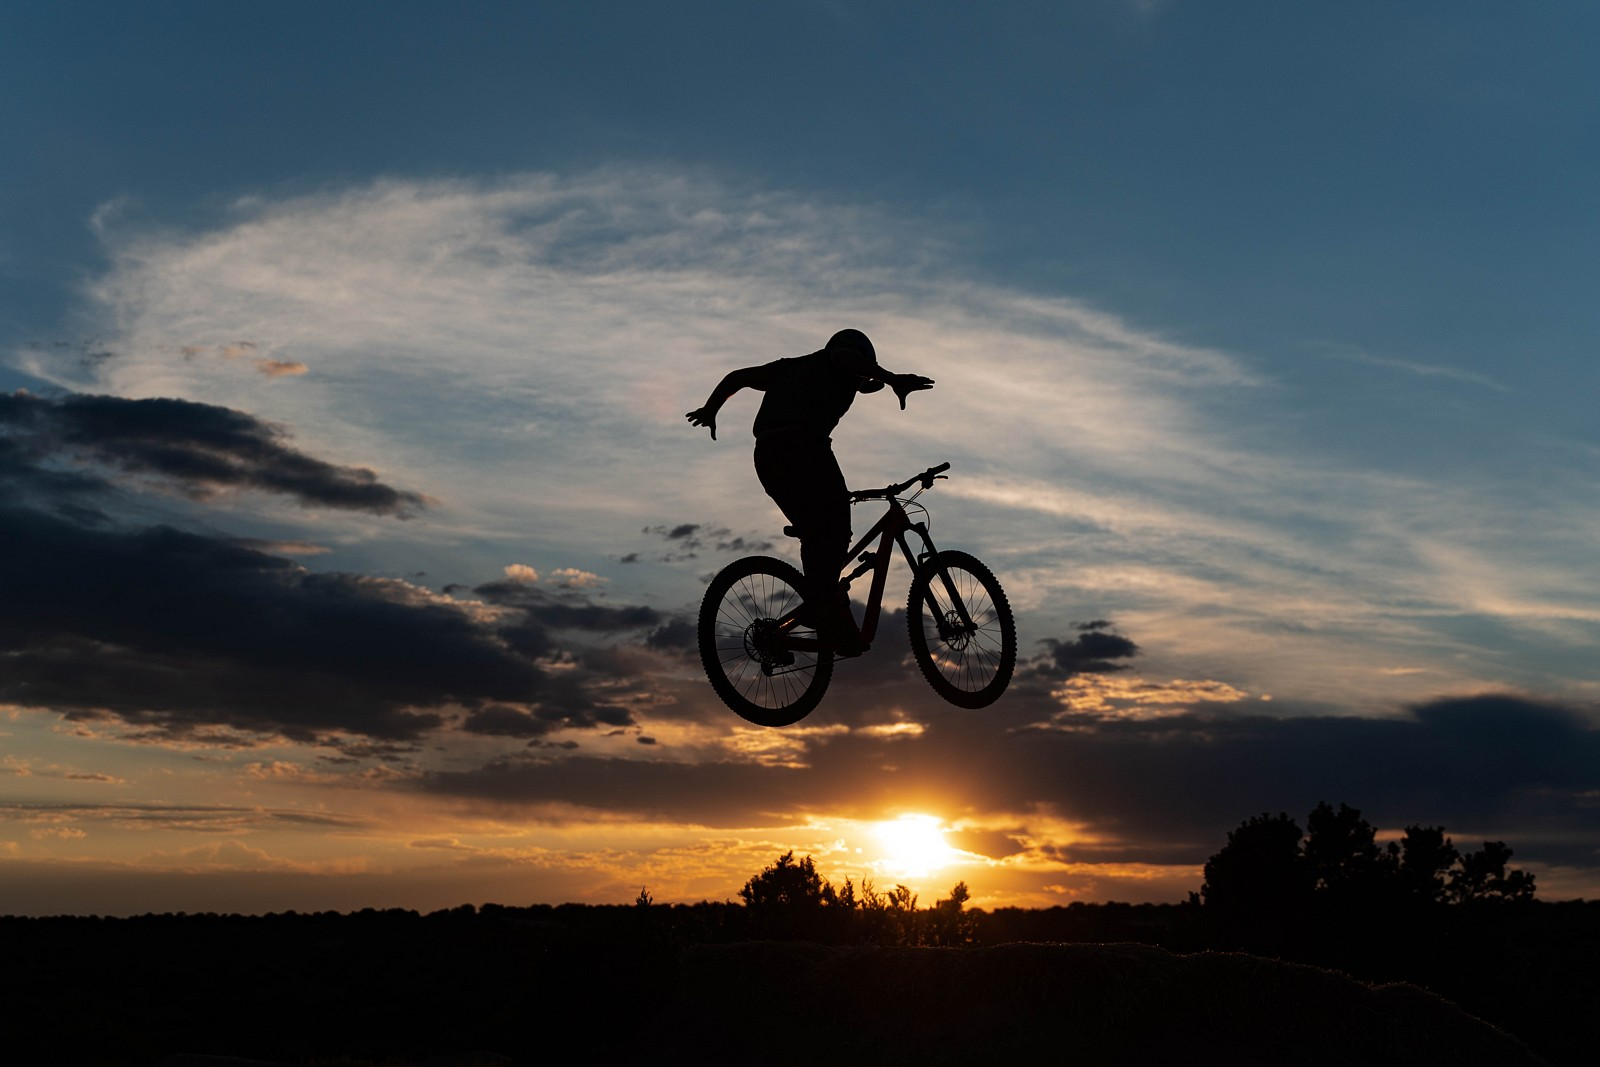 James No-Hander - legpwr - Mountain Biking Pictures - Vital MTB